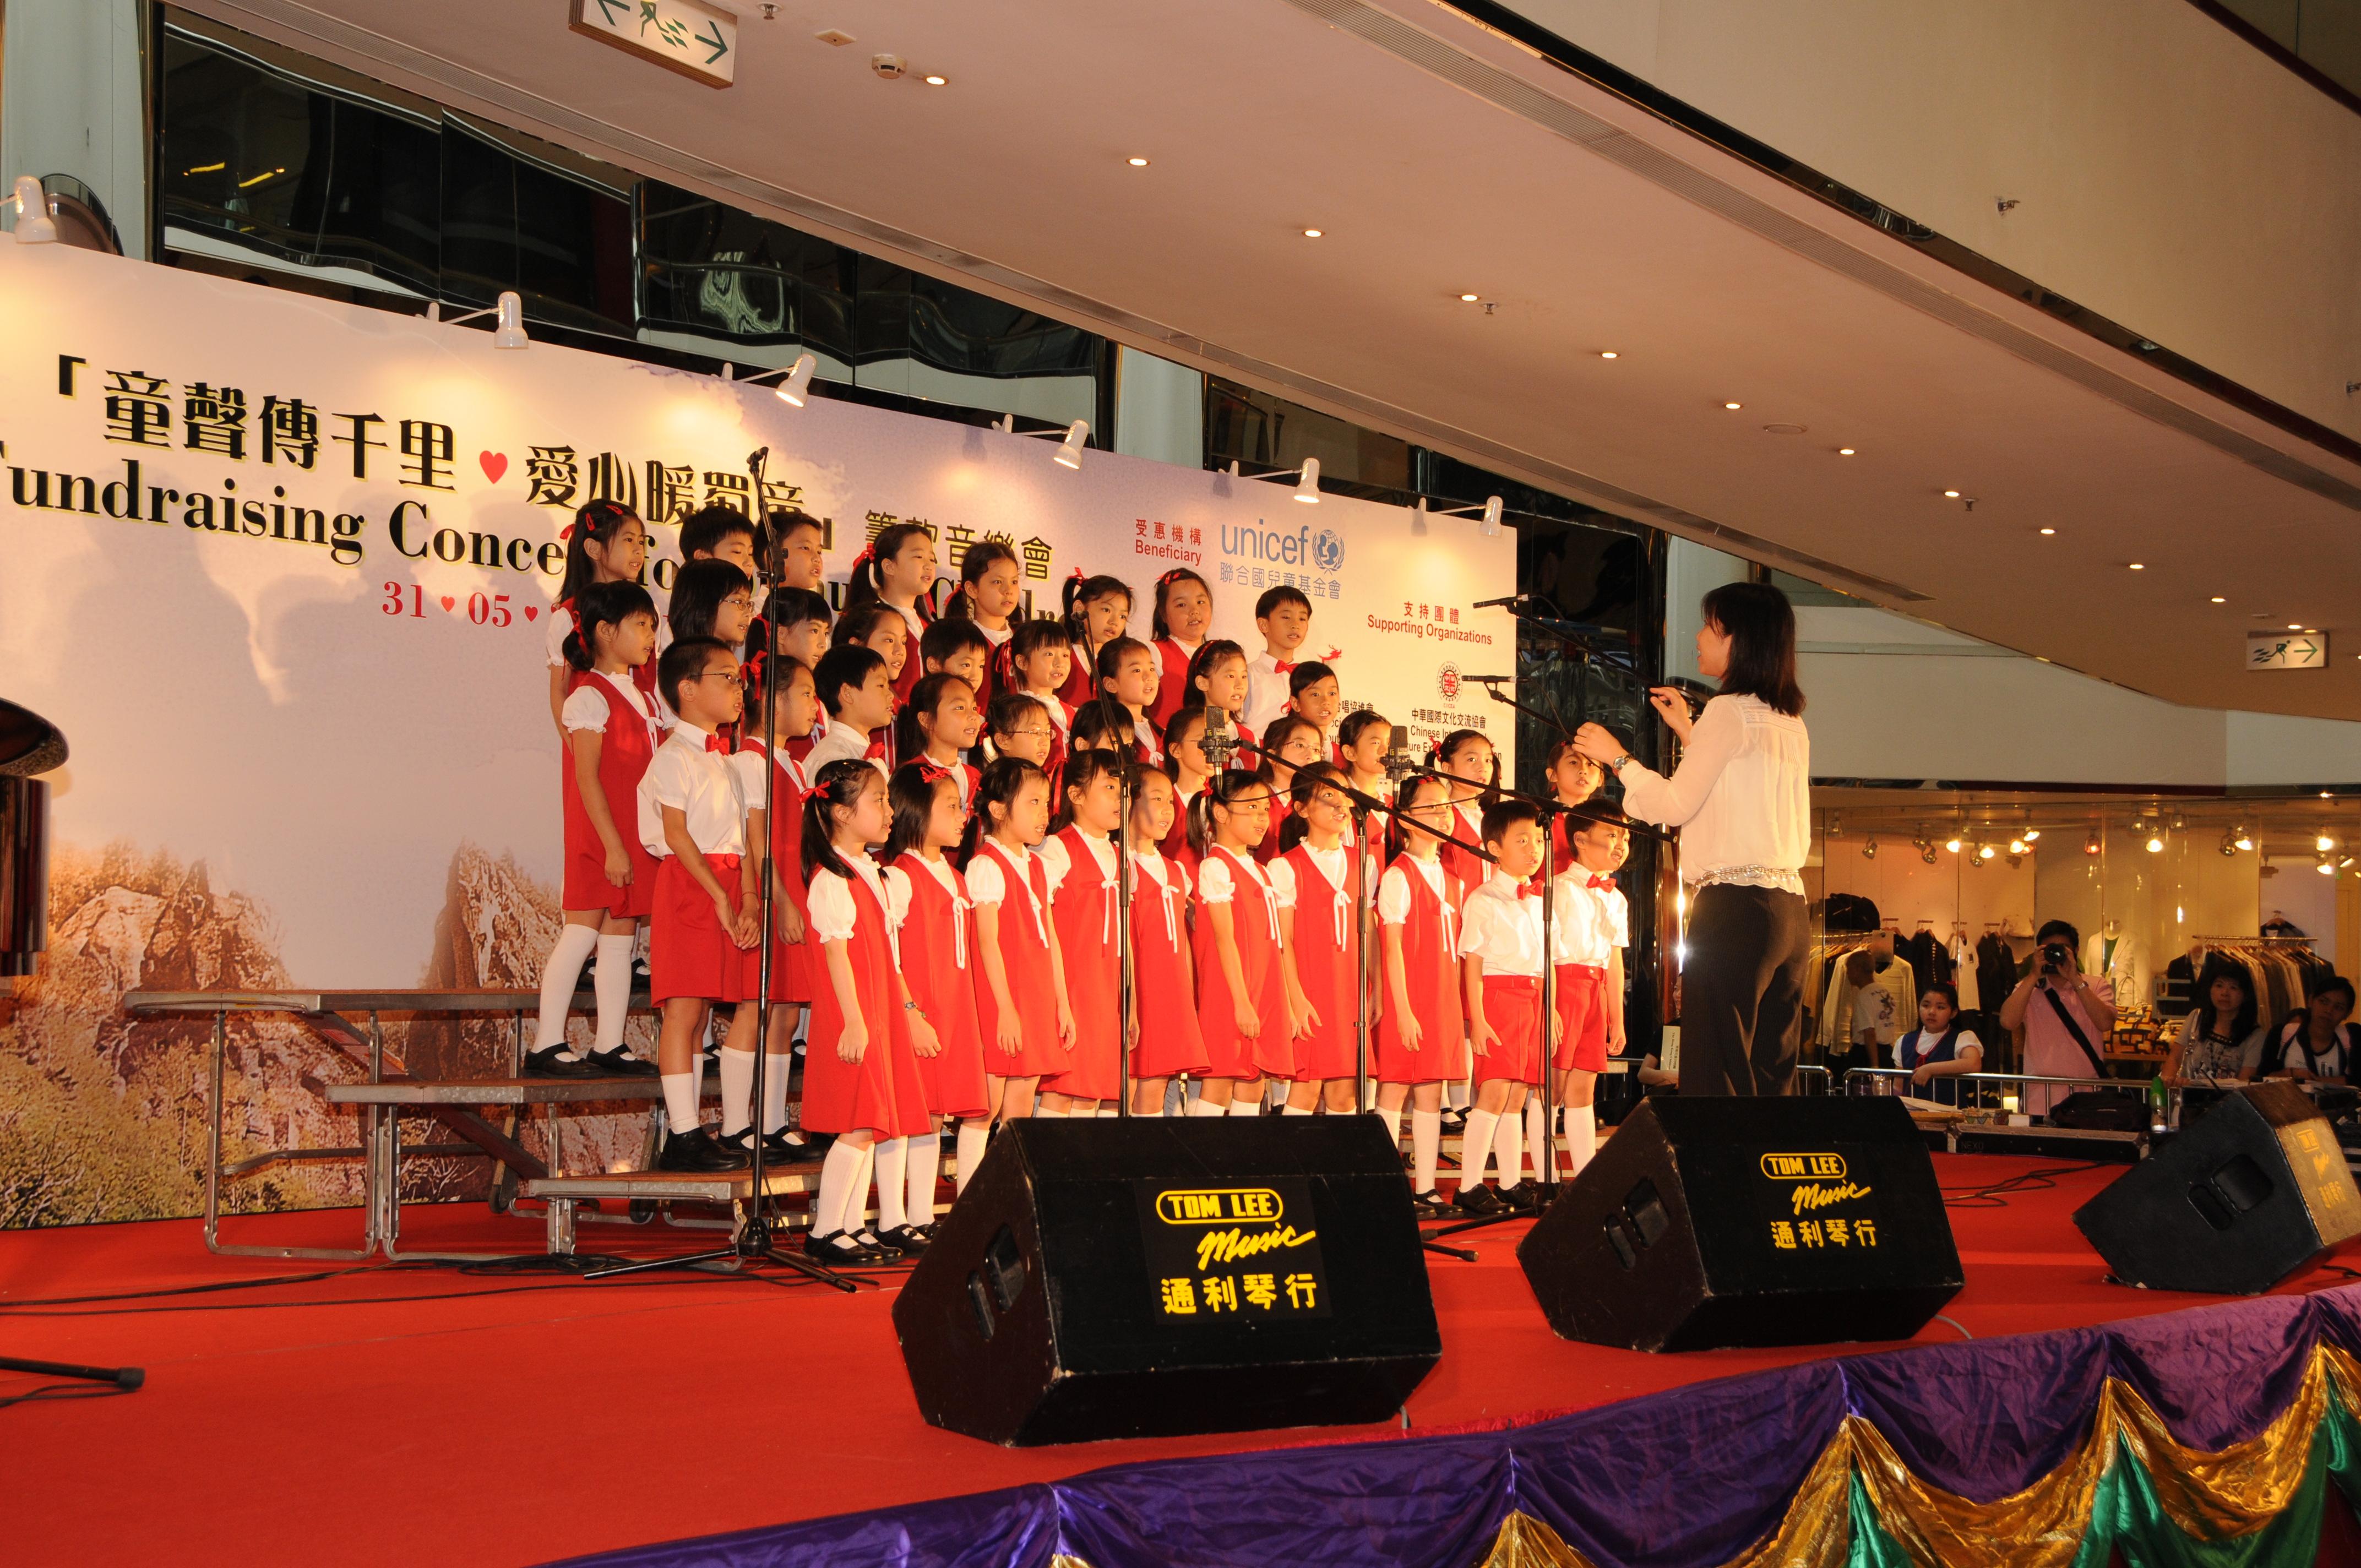 https://hkcchoir.org/sites/default/files/charity_2008_sichuan3.jpg